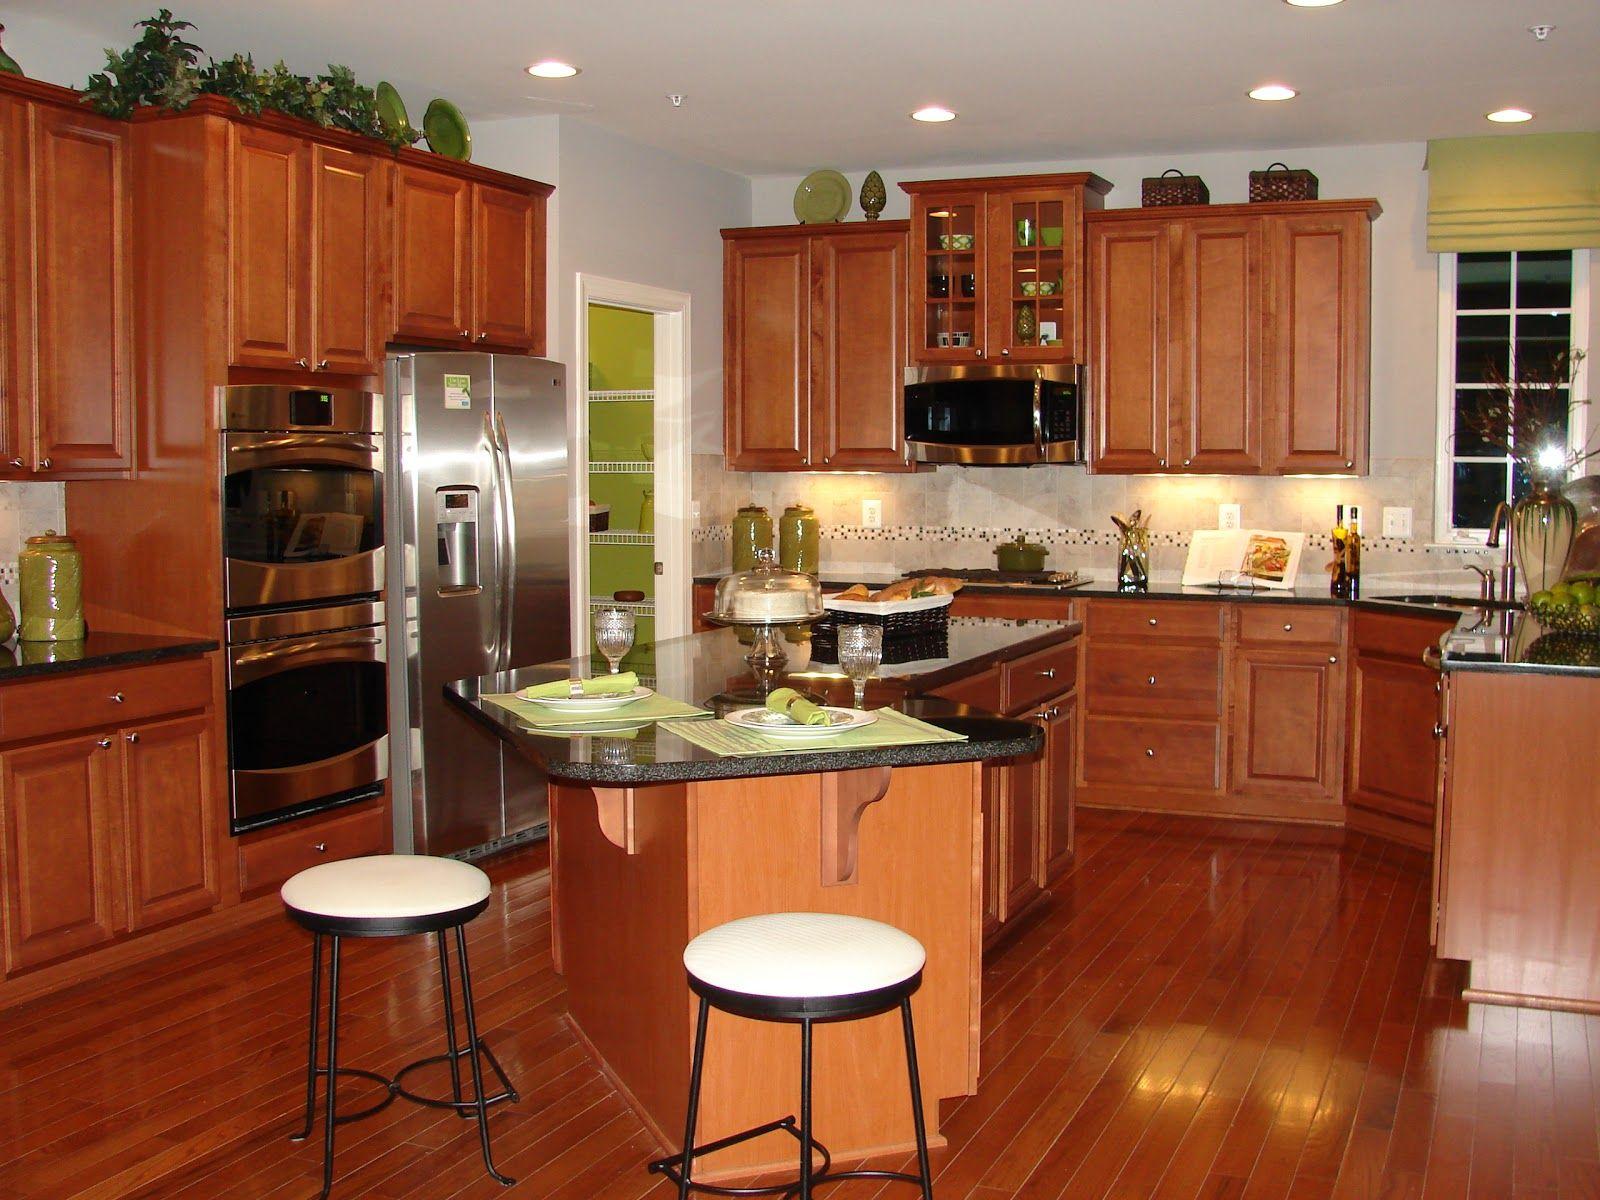 Ryan Homes Cognac Kitchen Cabinets - Avalon Model